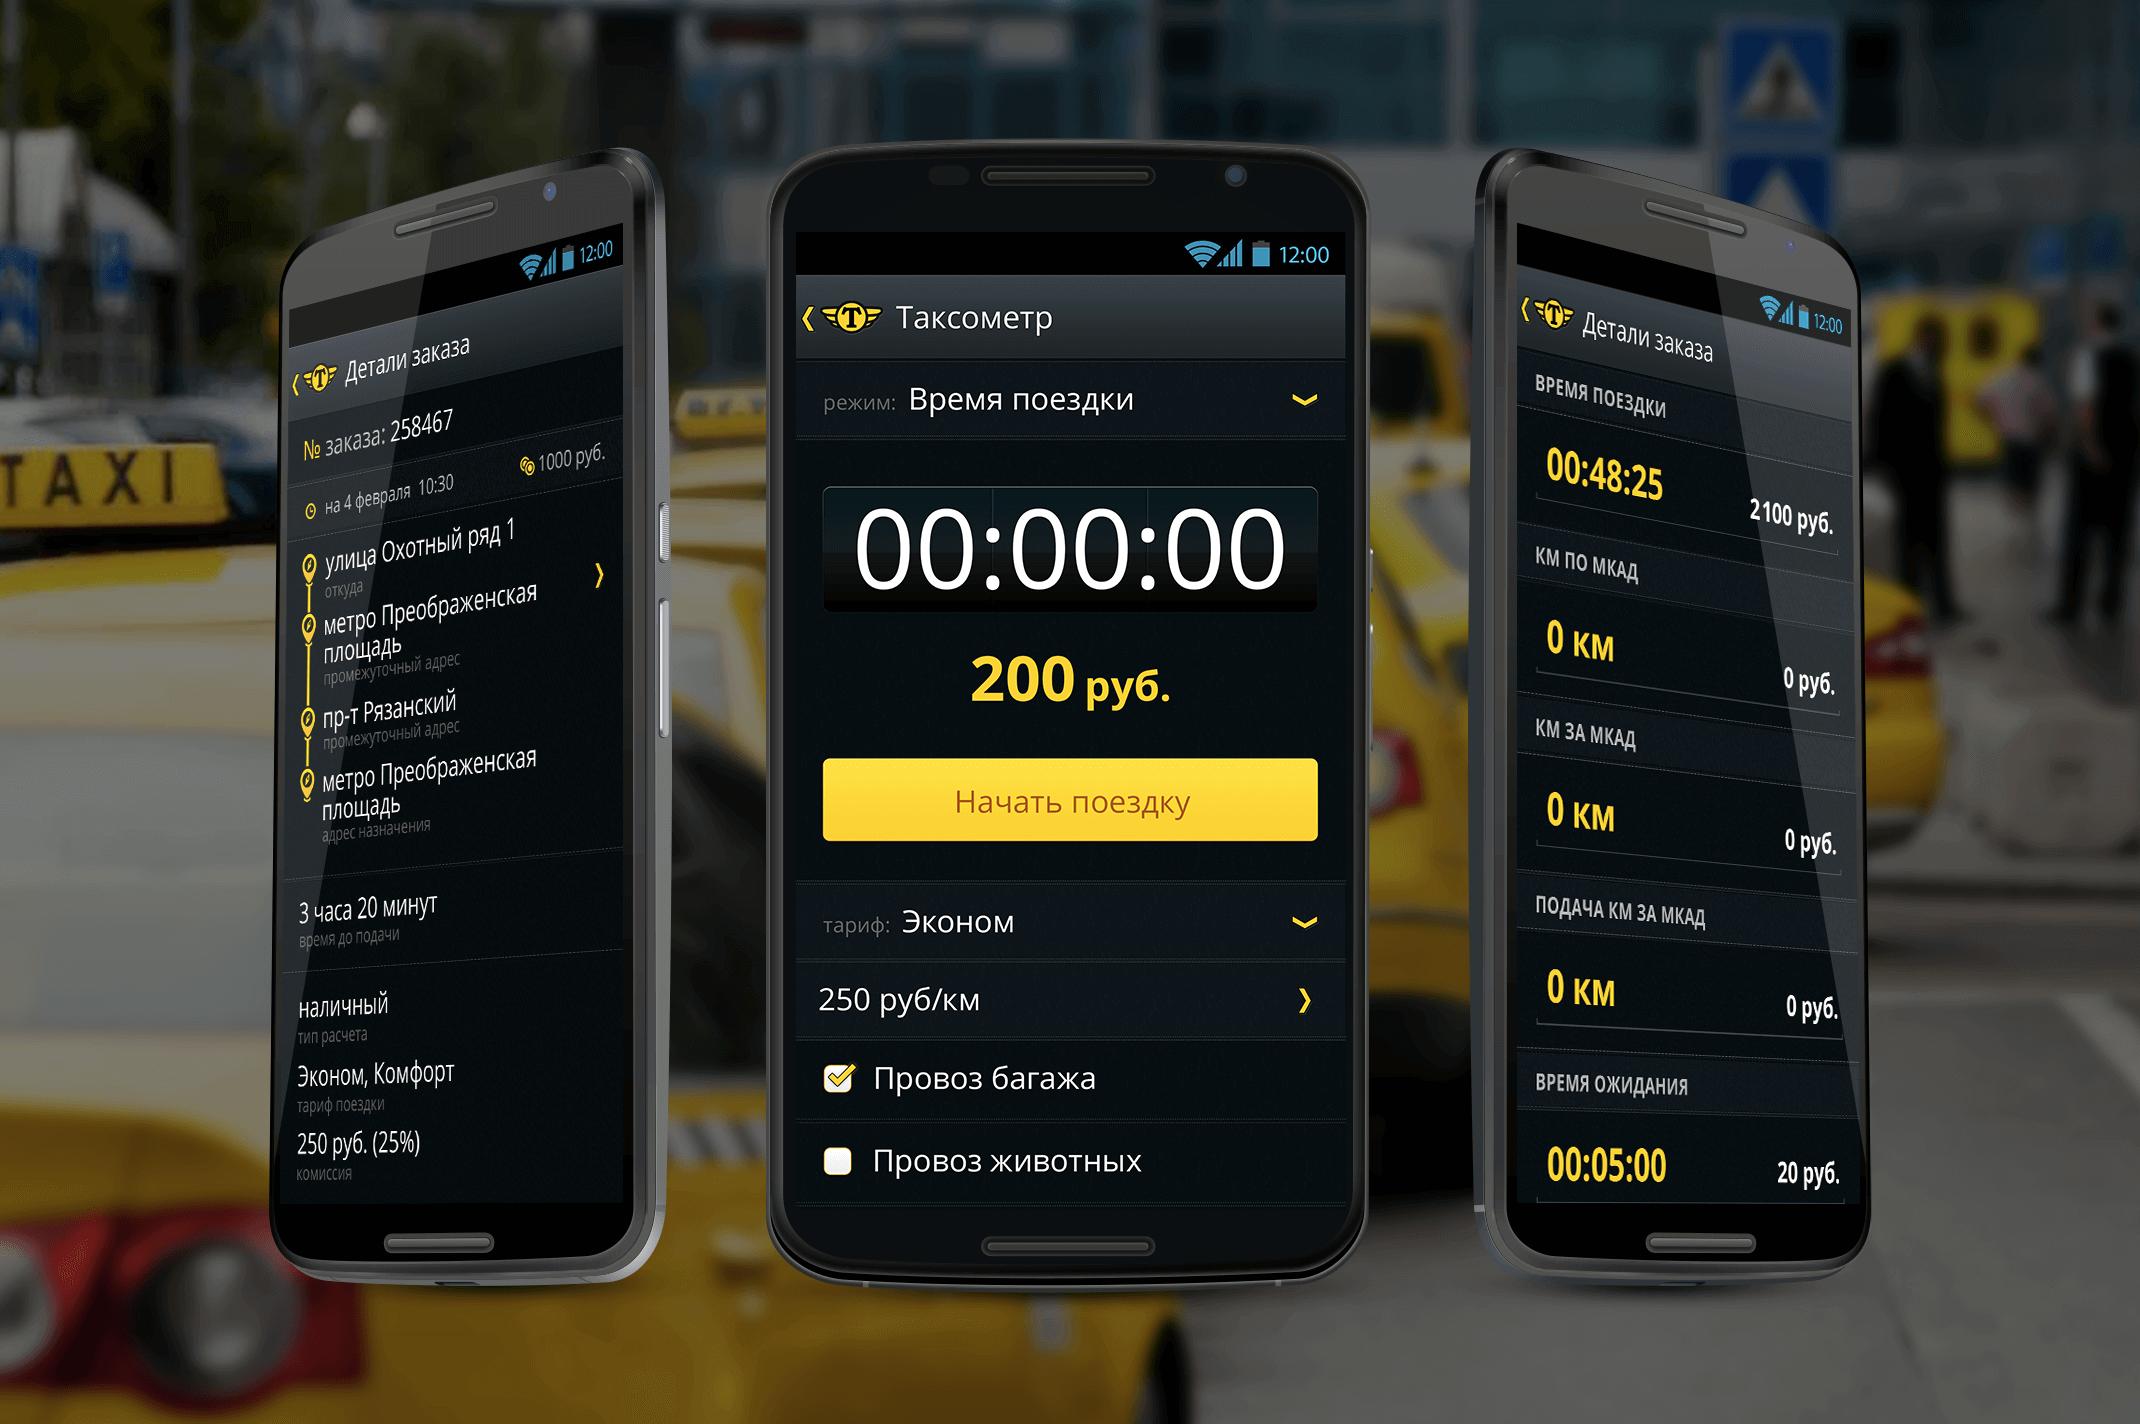 taxik taxi app